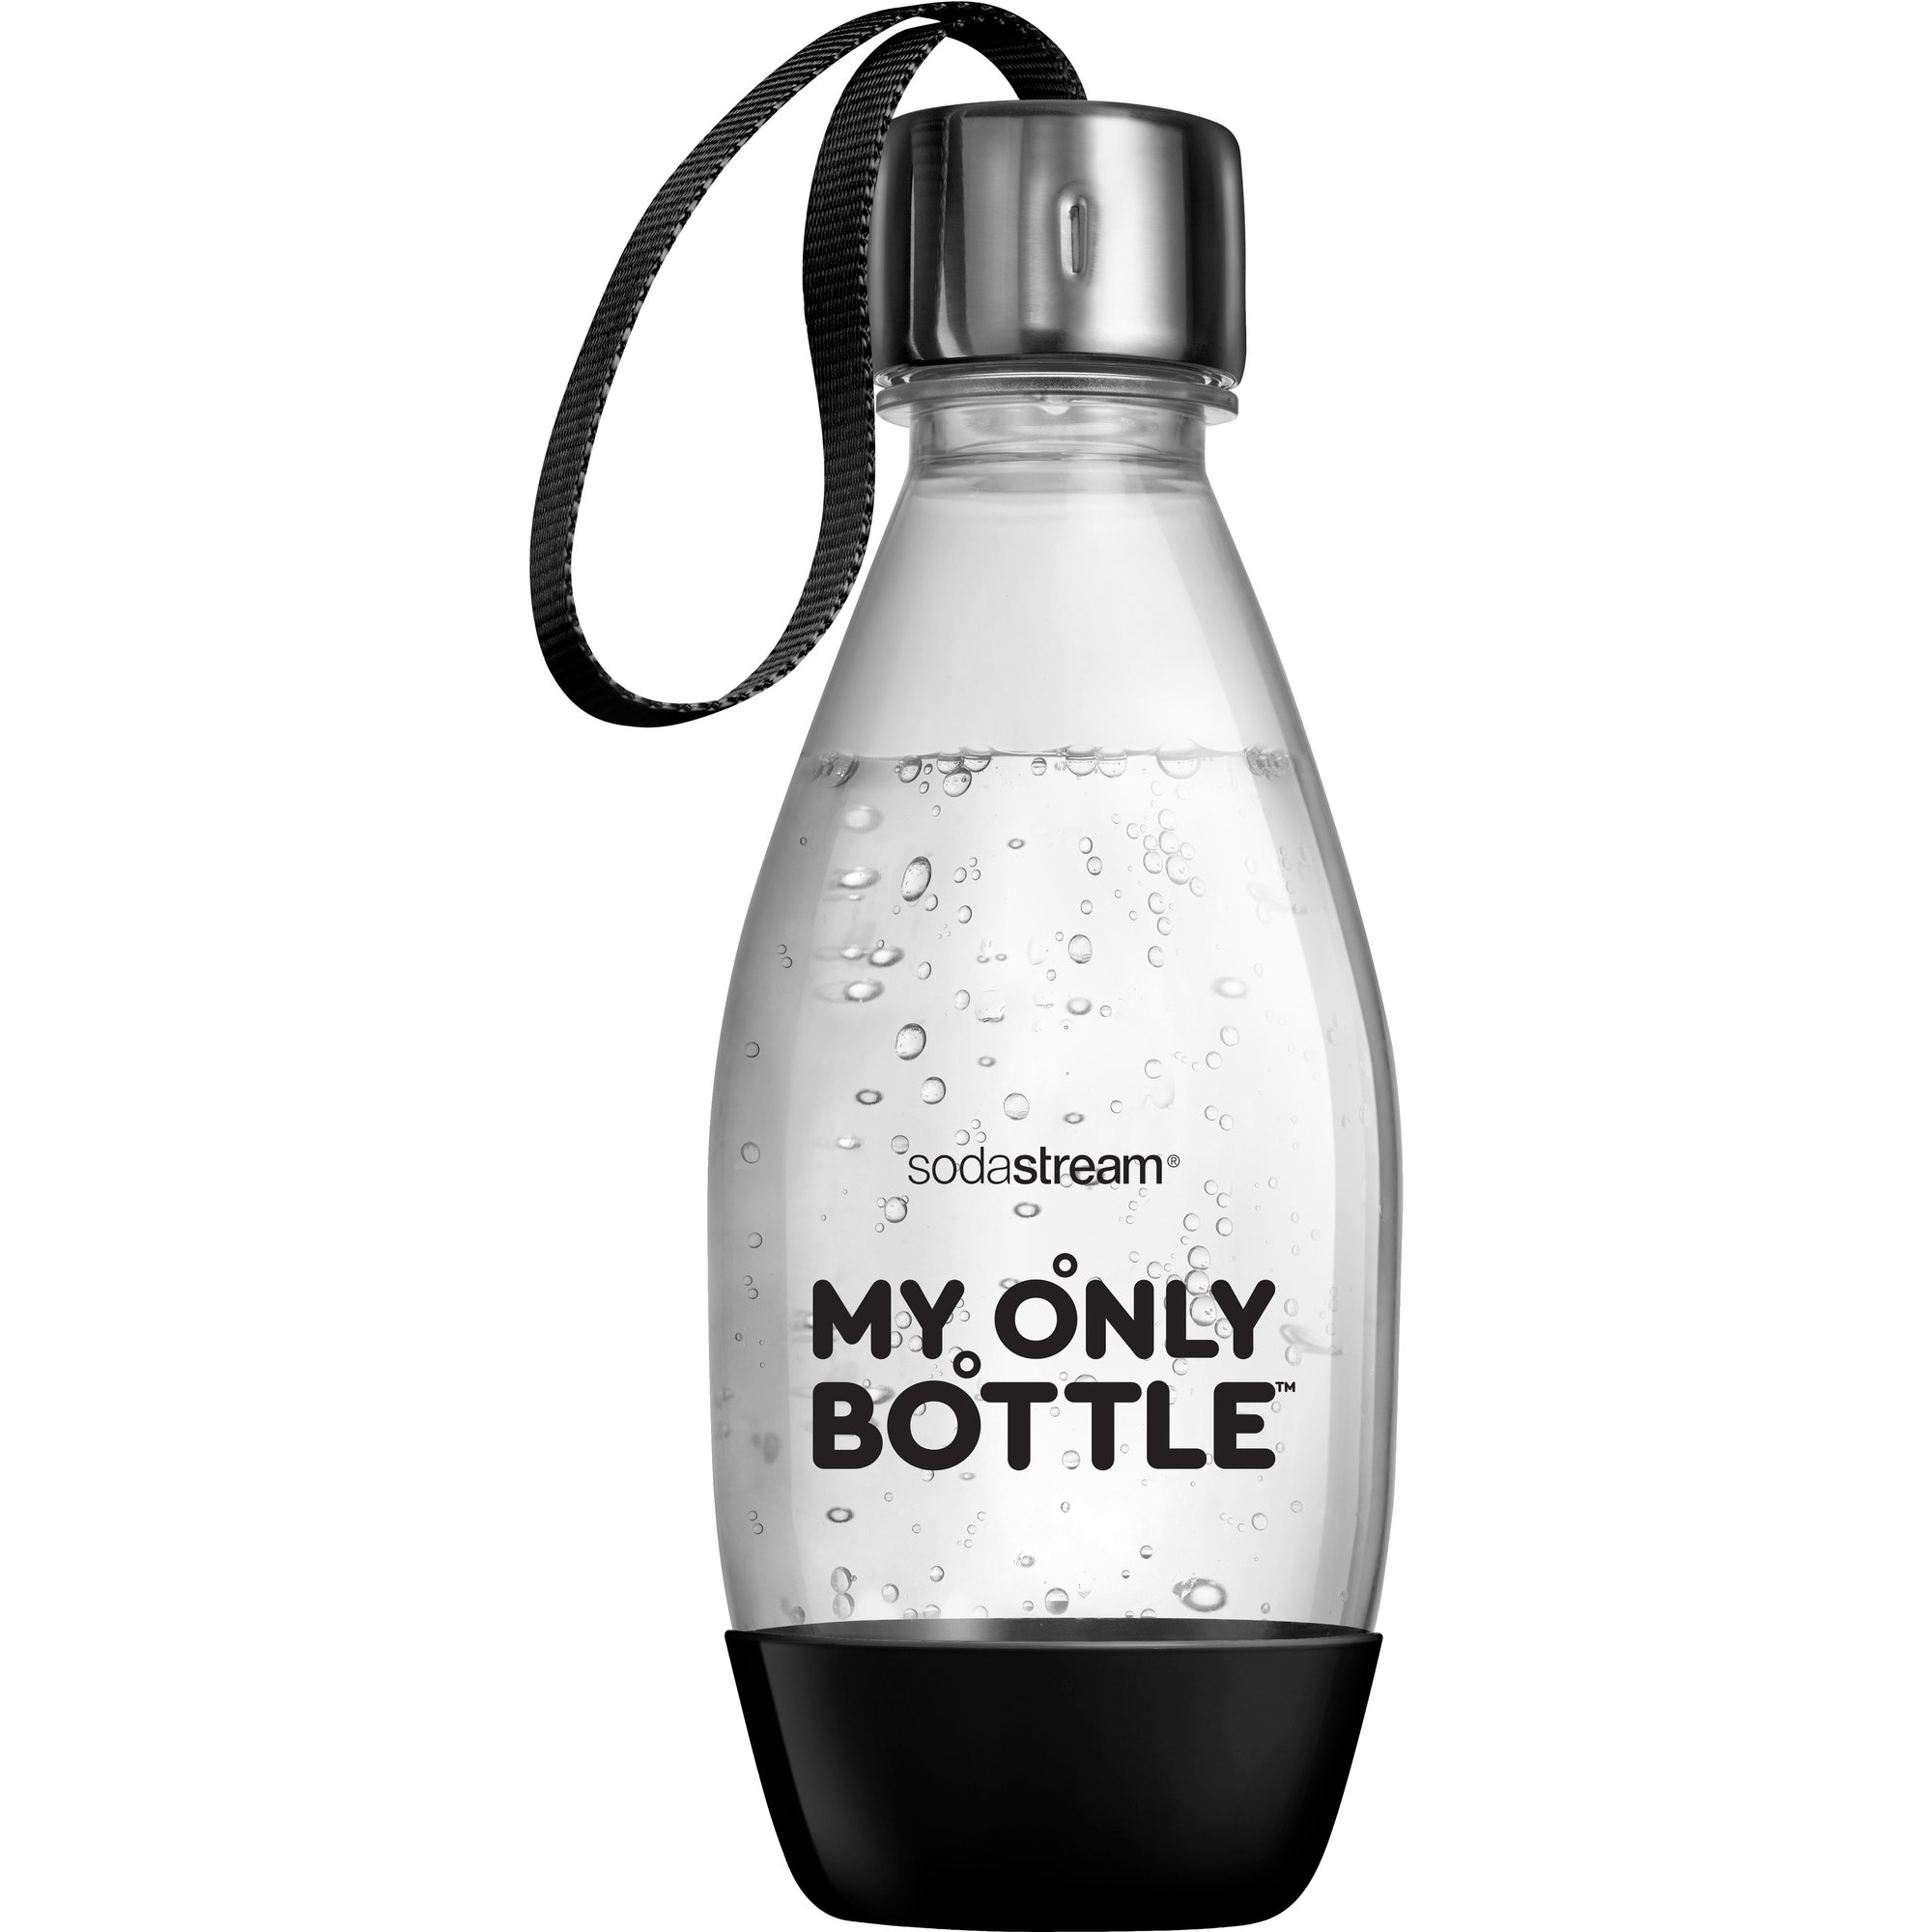 SodaStream My Only Bottle dricksflaska svart